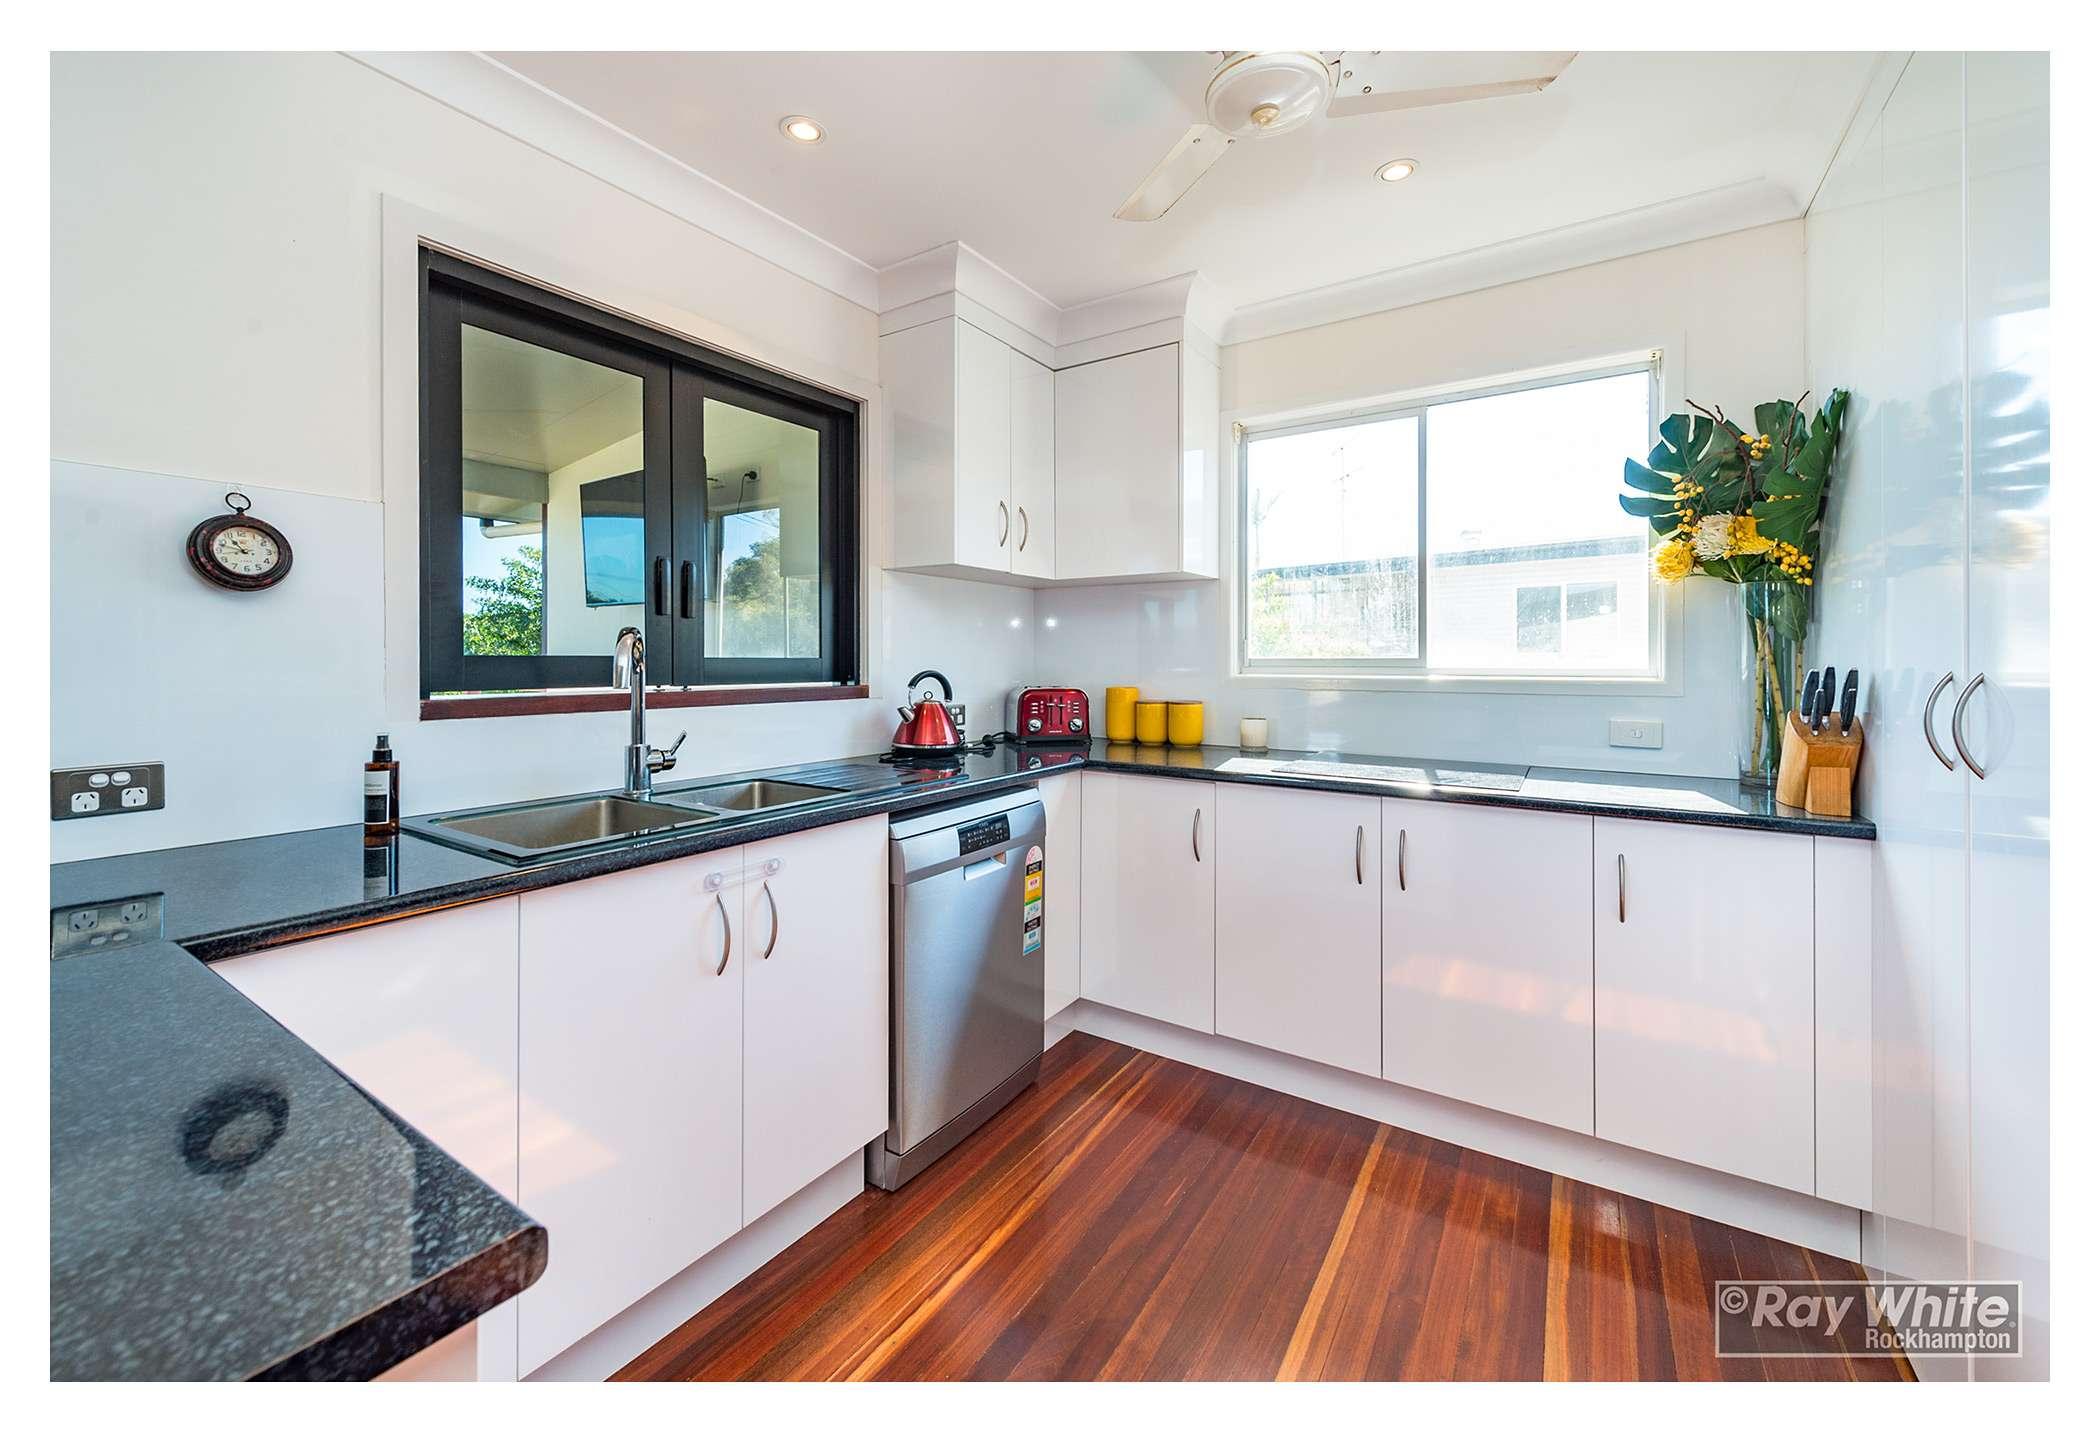 383 Philp Avenue, Frenchville, QLD 4701